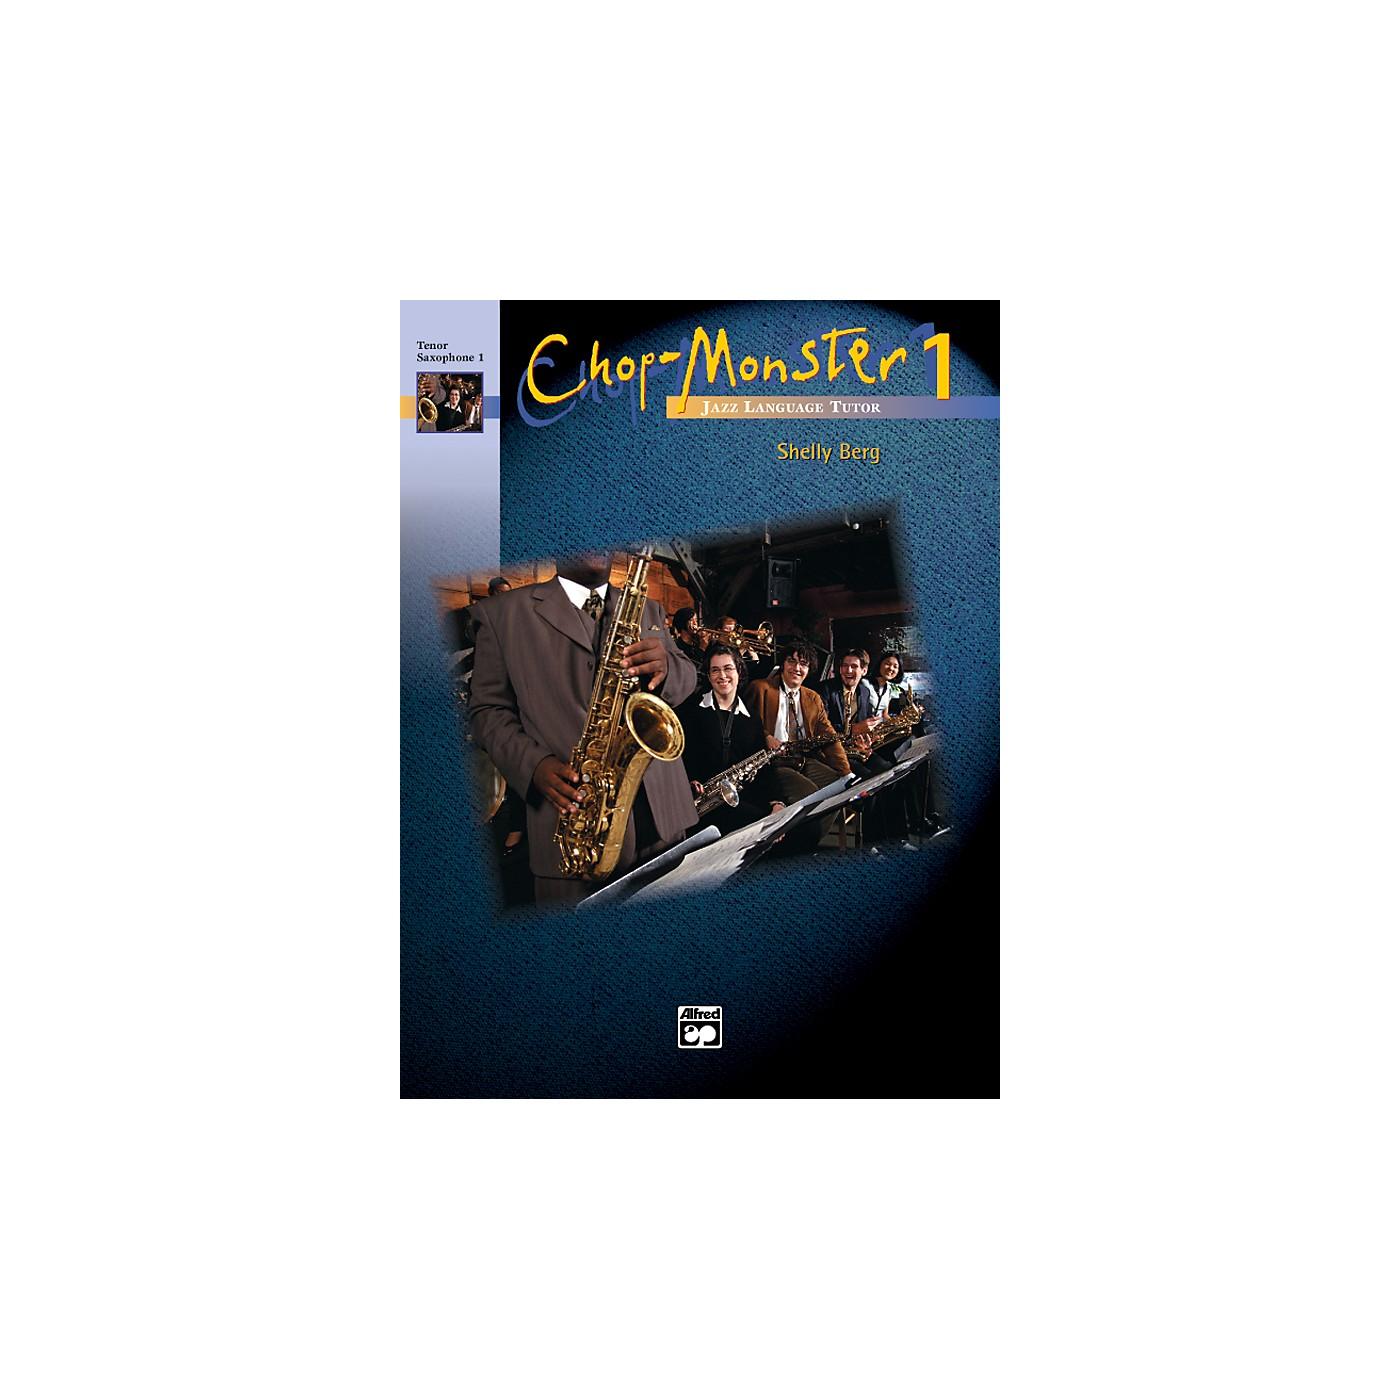 Alfred Chop-Monster Book 1 Trombone 3 Book thumbnail